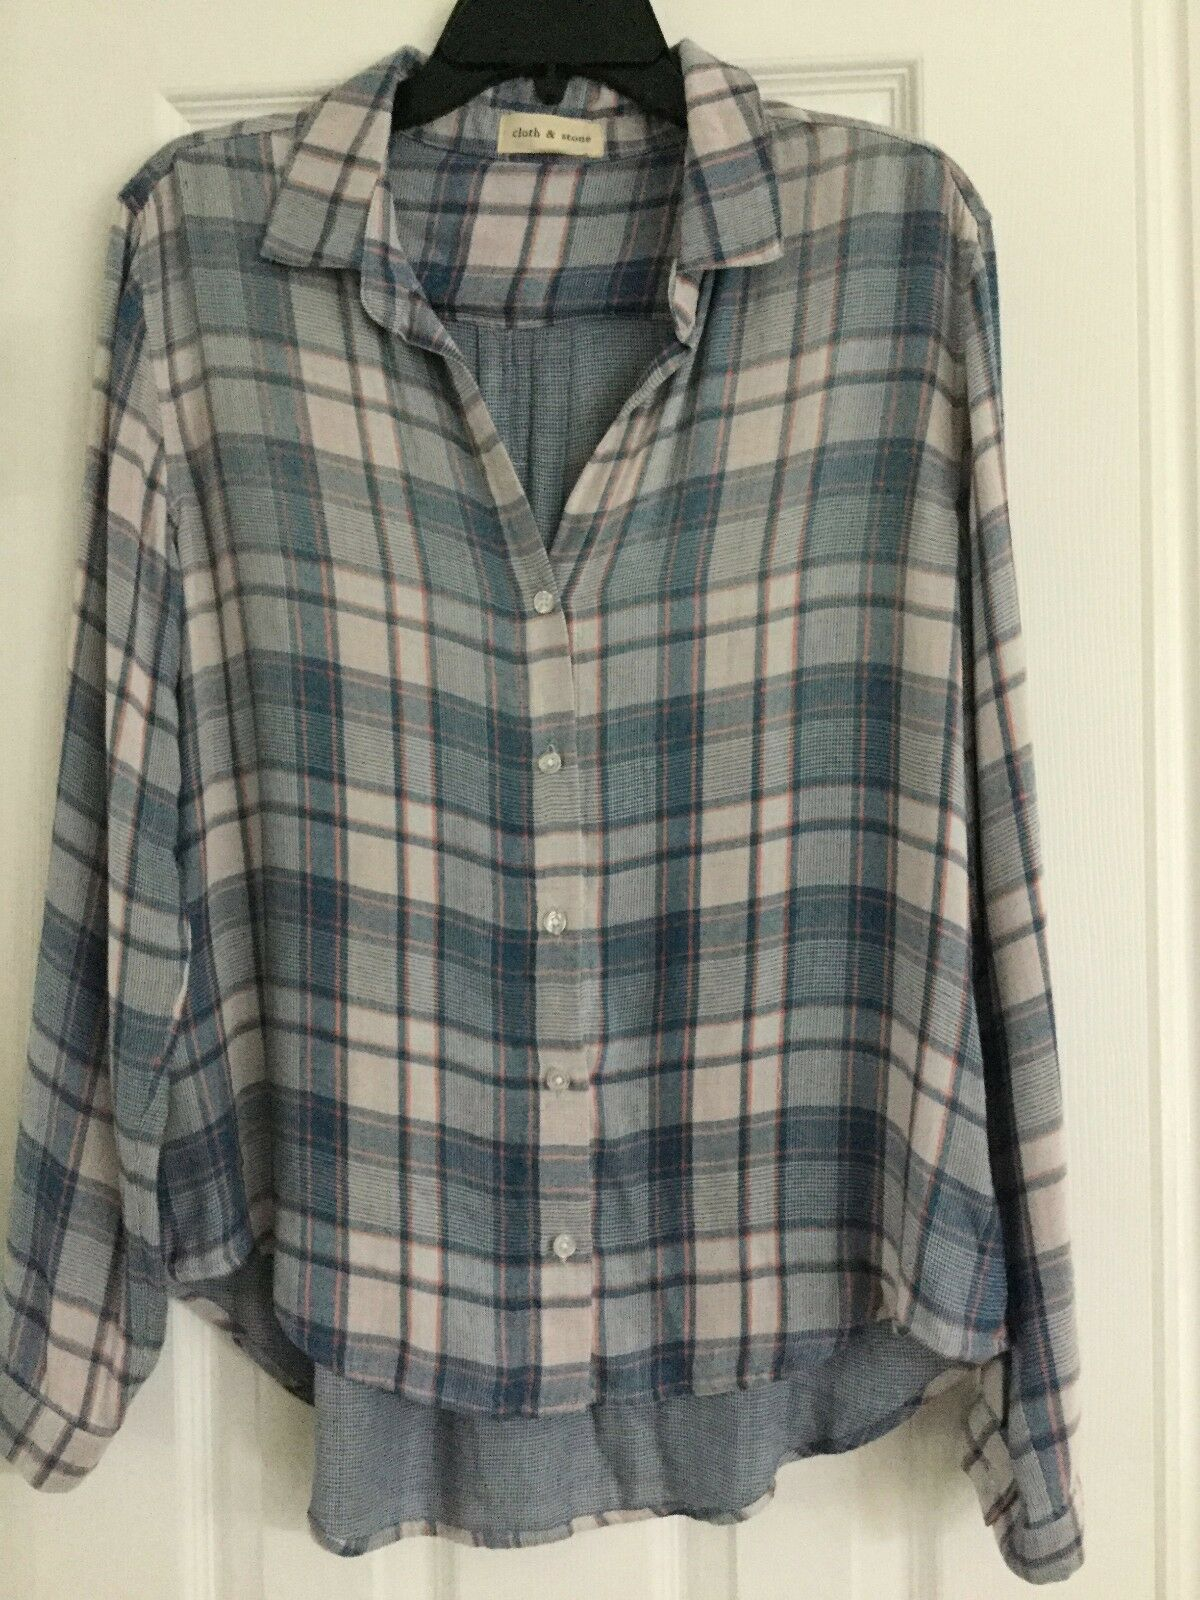 NEW CLOTH & STONE SzXS DOUBLE PLAID BUTTON DOWN LONG SLEEVE SHIRT LIGHT Blau MUL